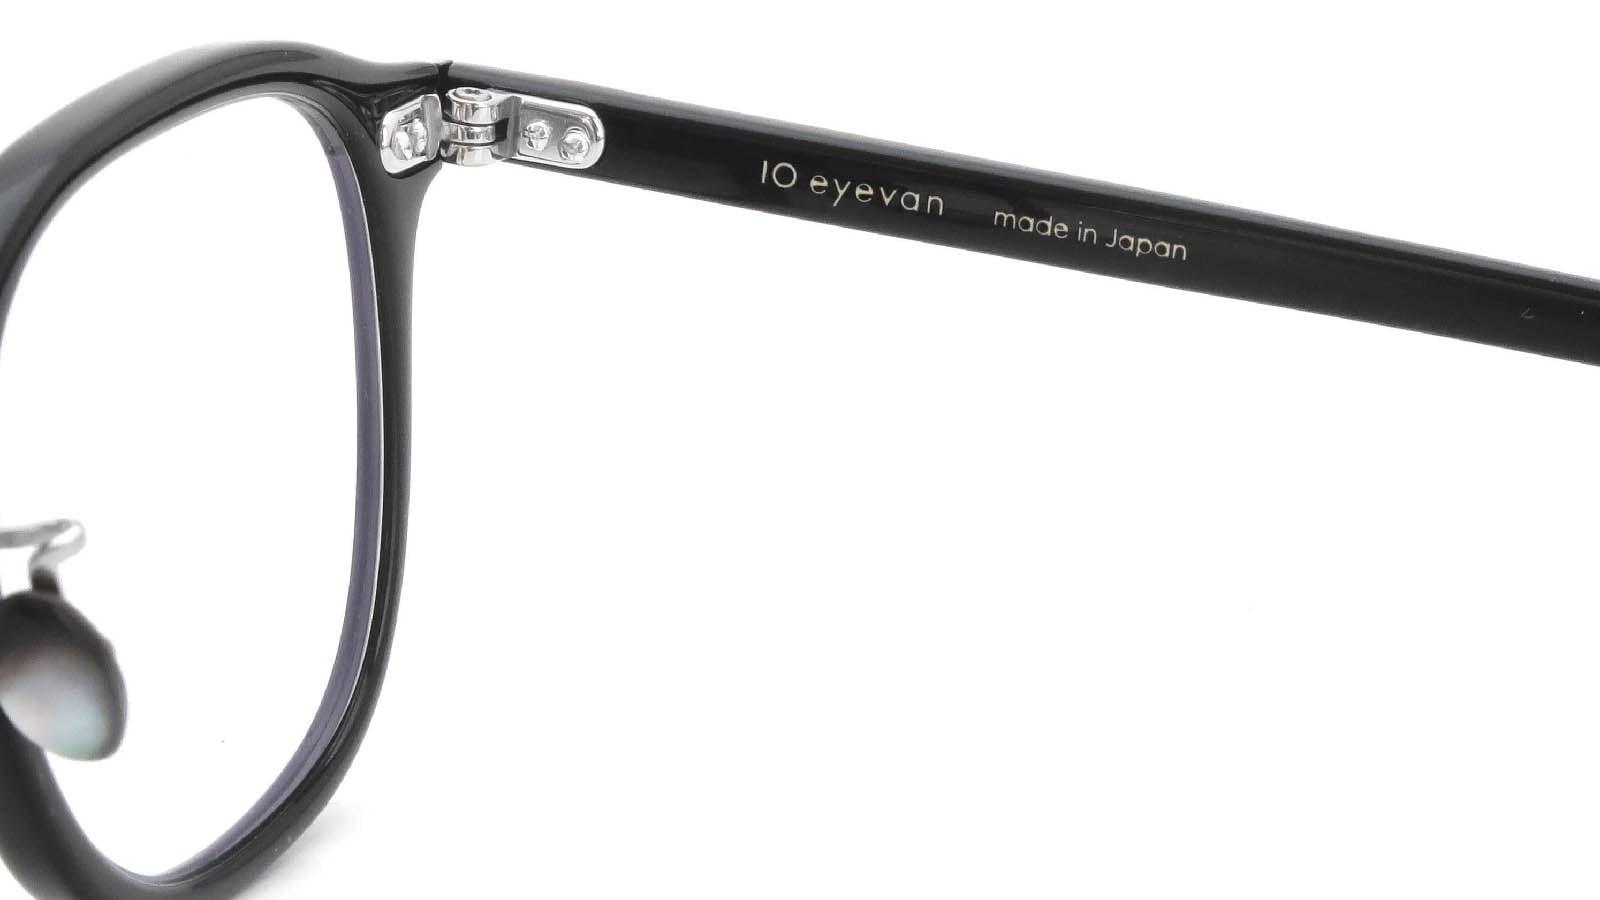 10 eyevan NO.7 Ⅲ 47size 11